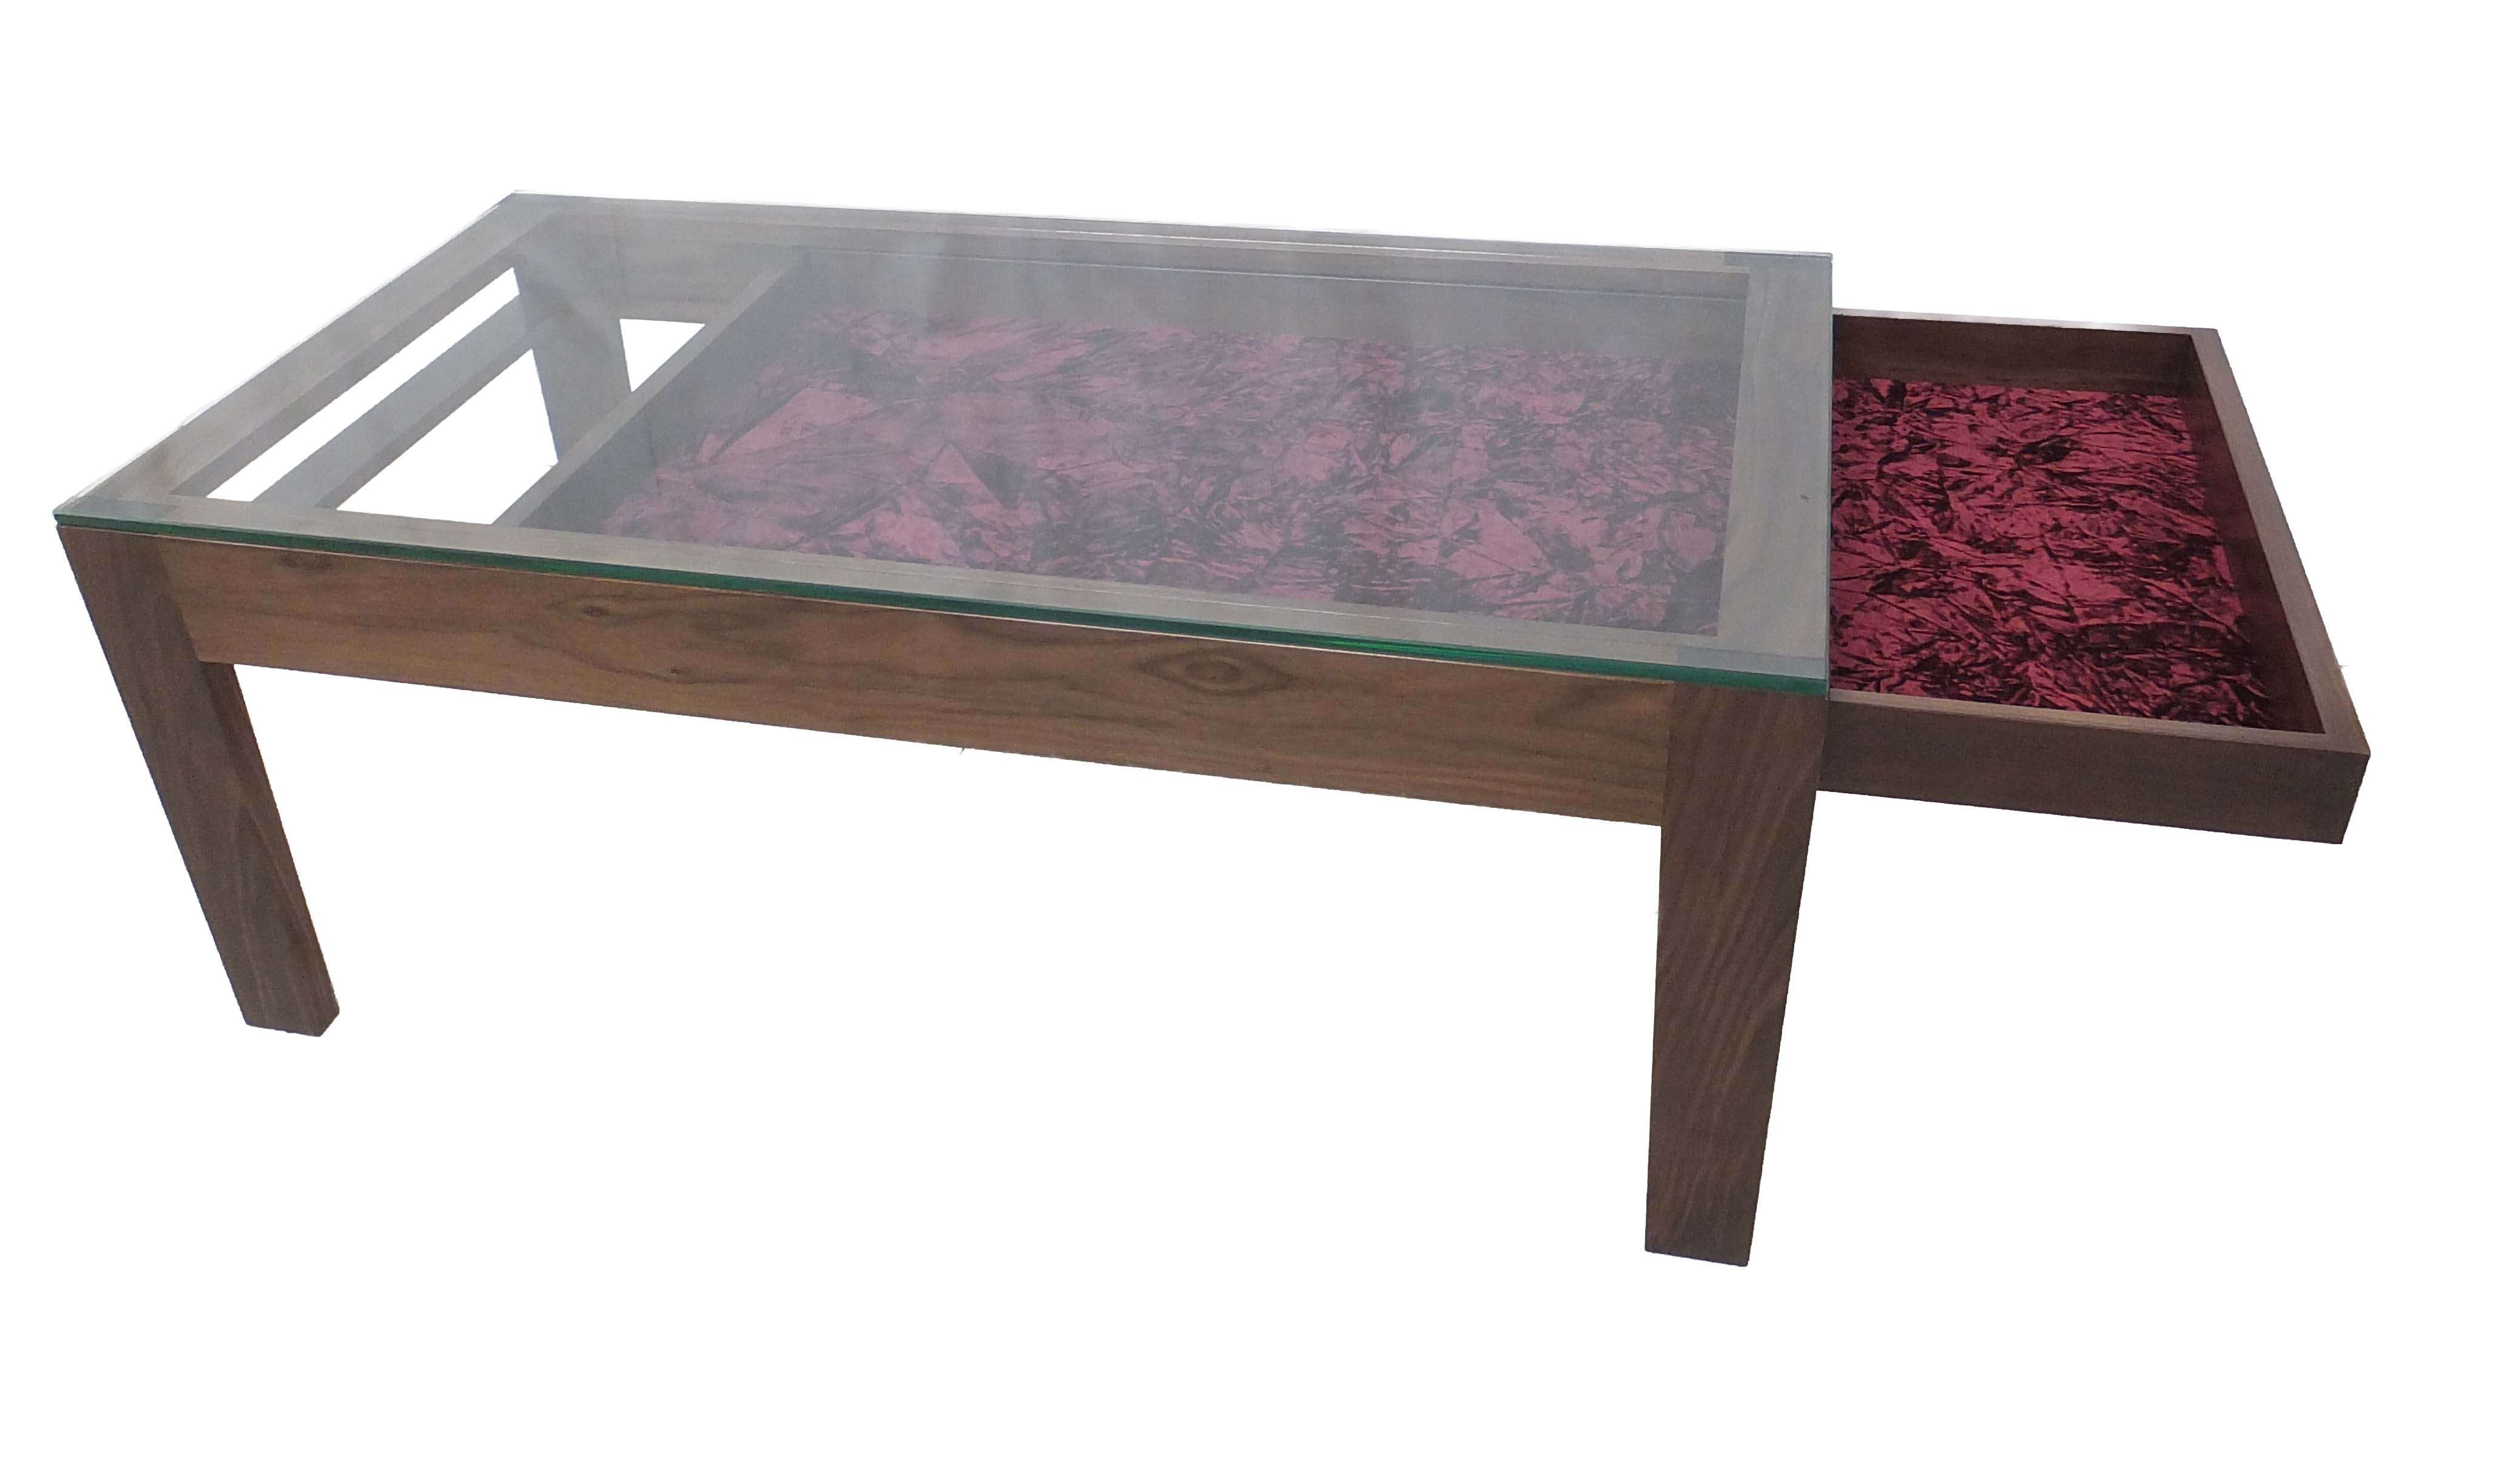 Coffee Table : Wonderful Glass Top Display Table Coffee Table With With Best And Newest Glass Top Display Coffee Tables With Drawers (View 12 of 20)